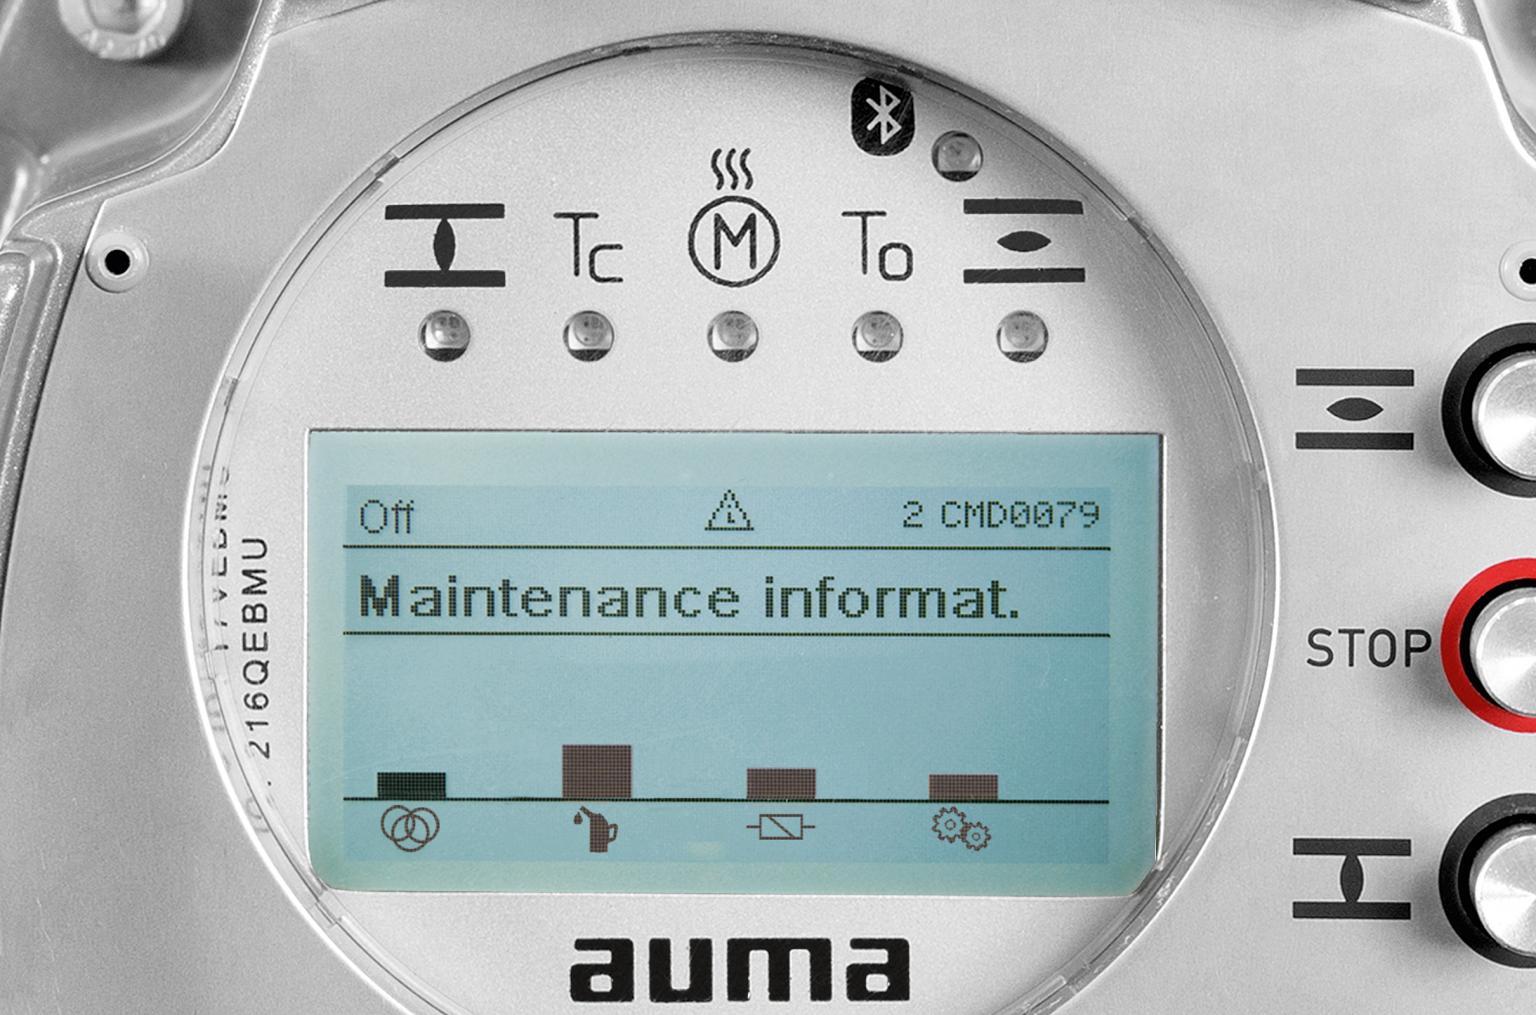 AUMA actuators address key current requirements for asset management and predictive maintenance